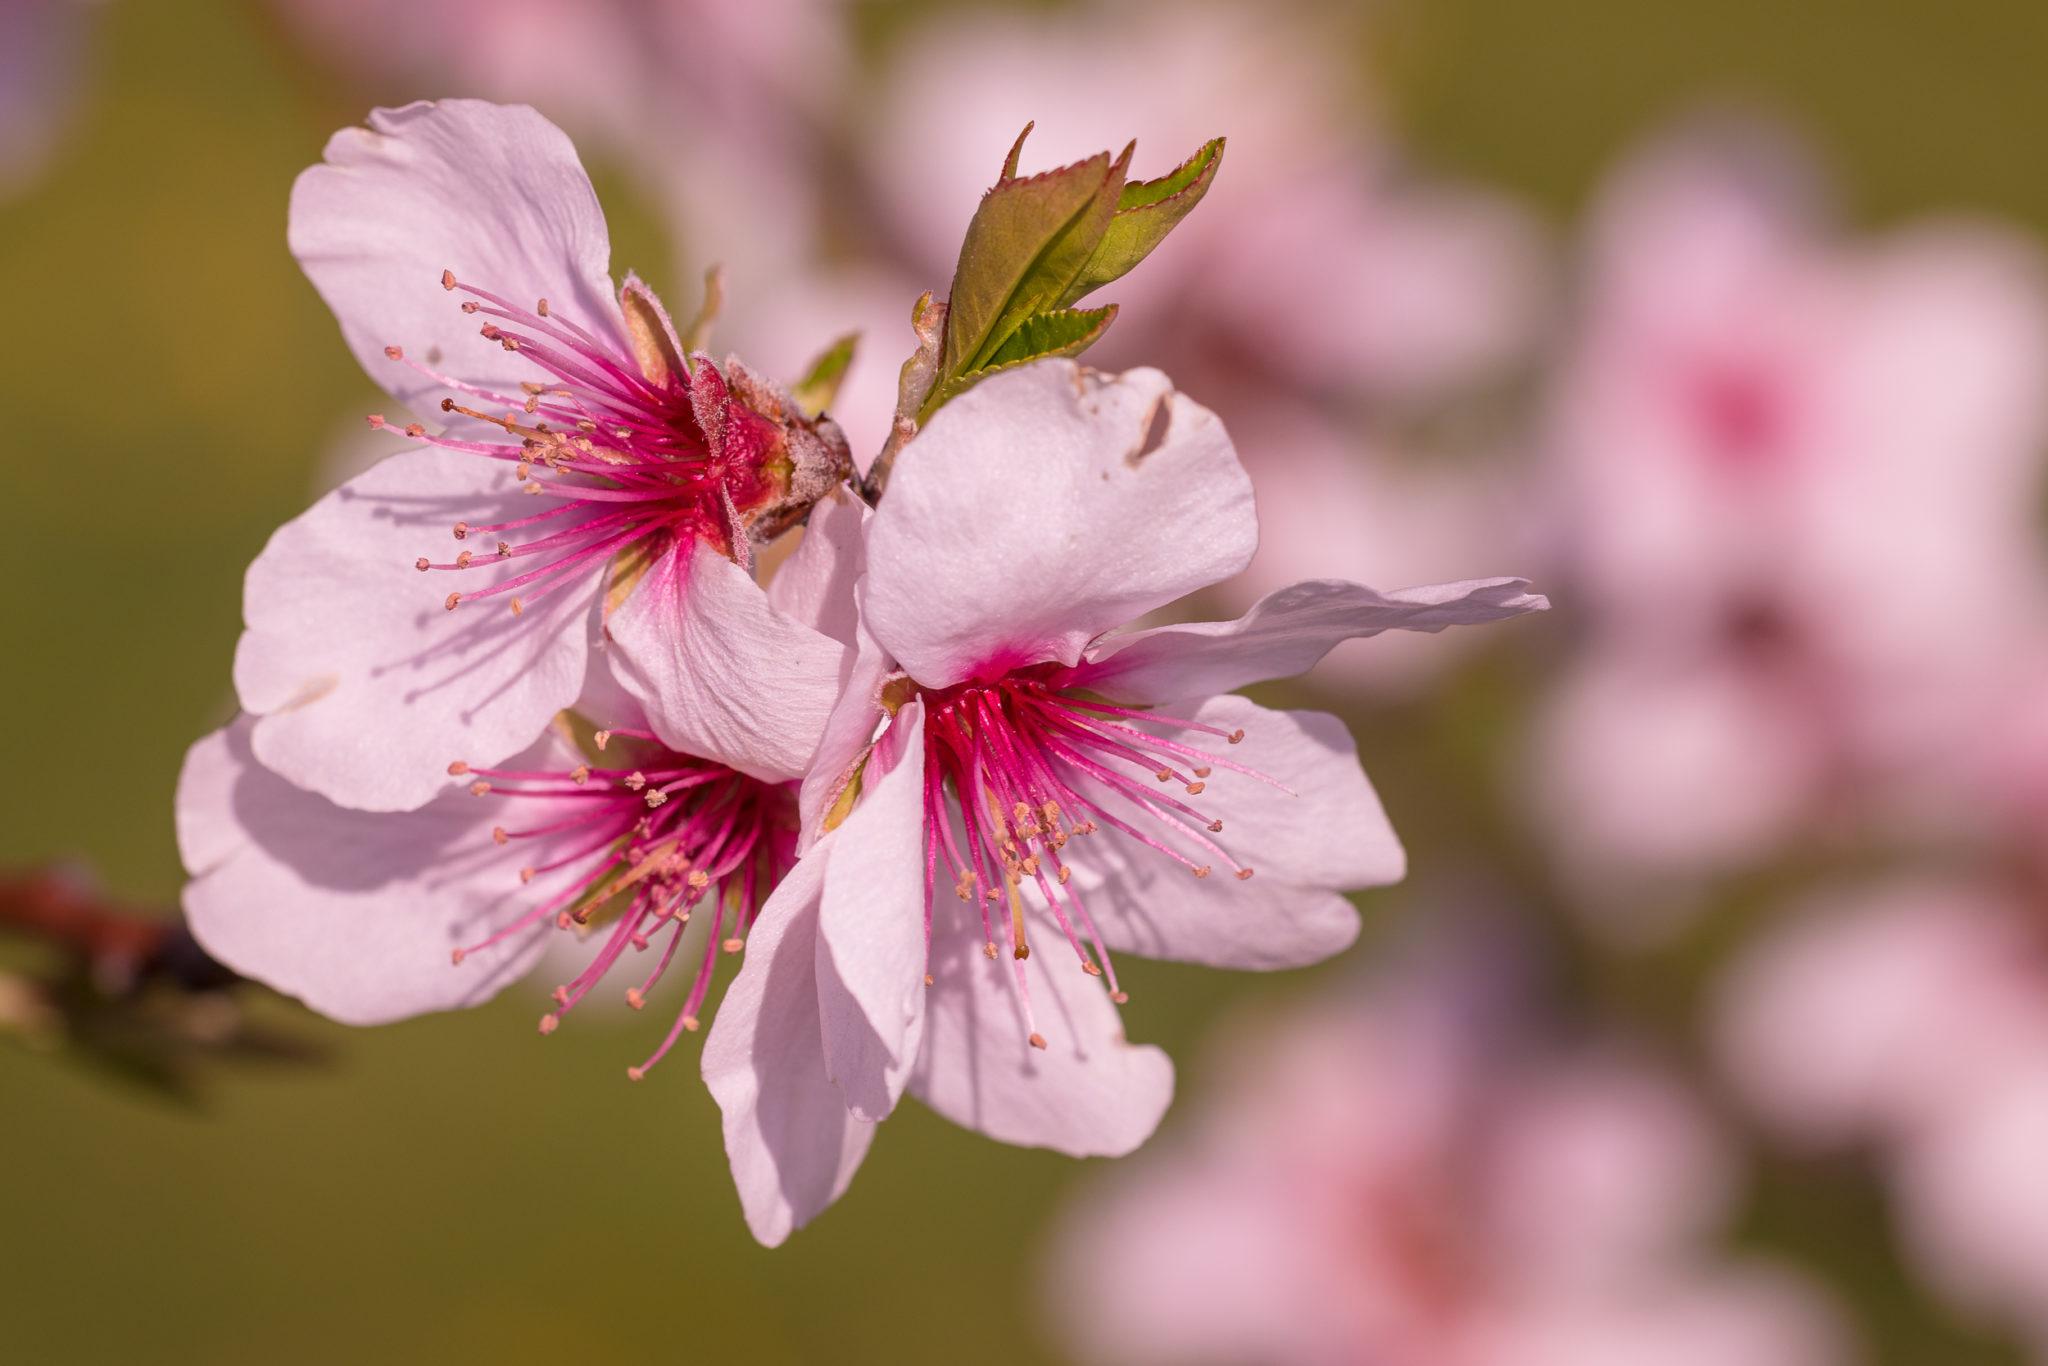 Mandelblüte in Rheinland-Pfalz,Prunus dulcis,Naturfotografie Olaf & Sylvia Rentzsch